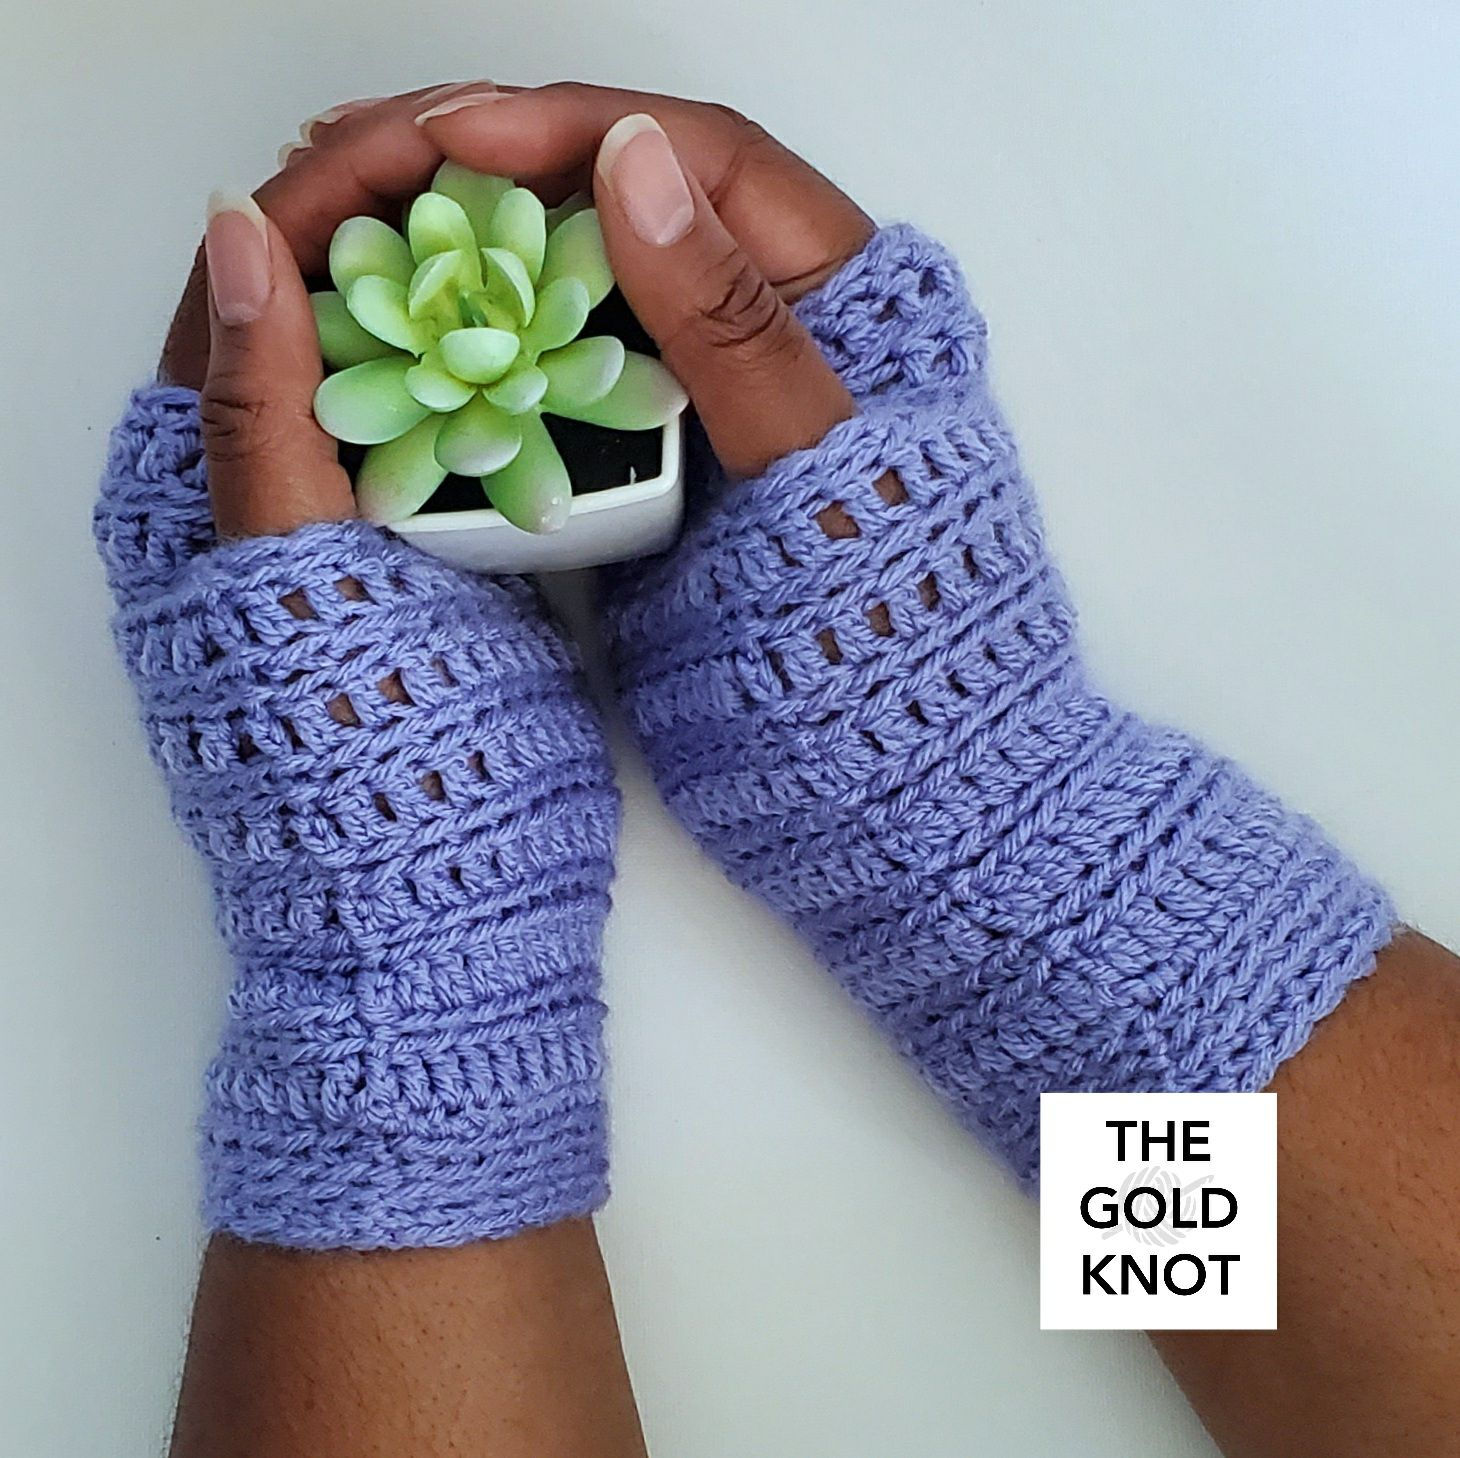 Periwinkle Crochet Fingerless Mittens